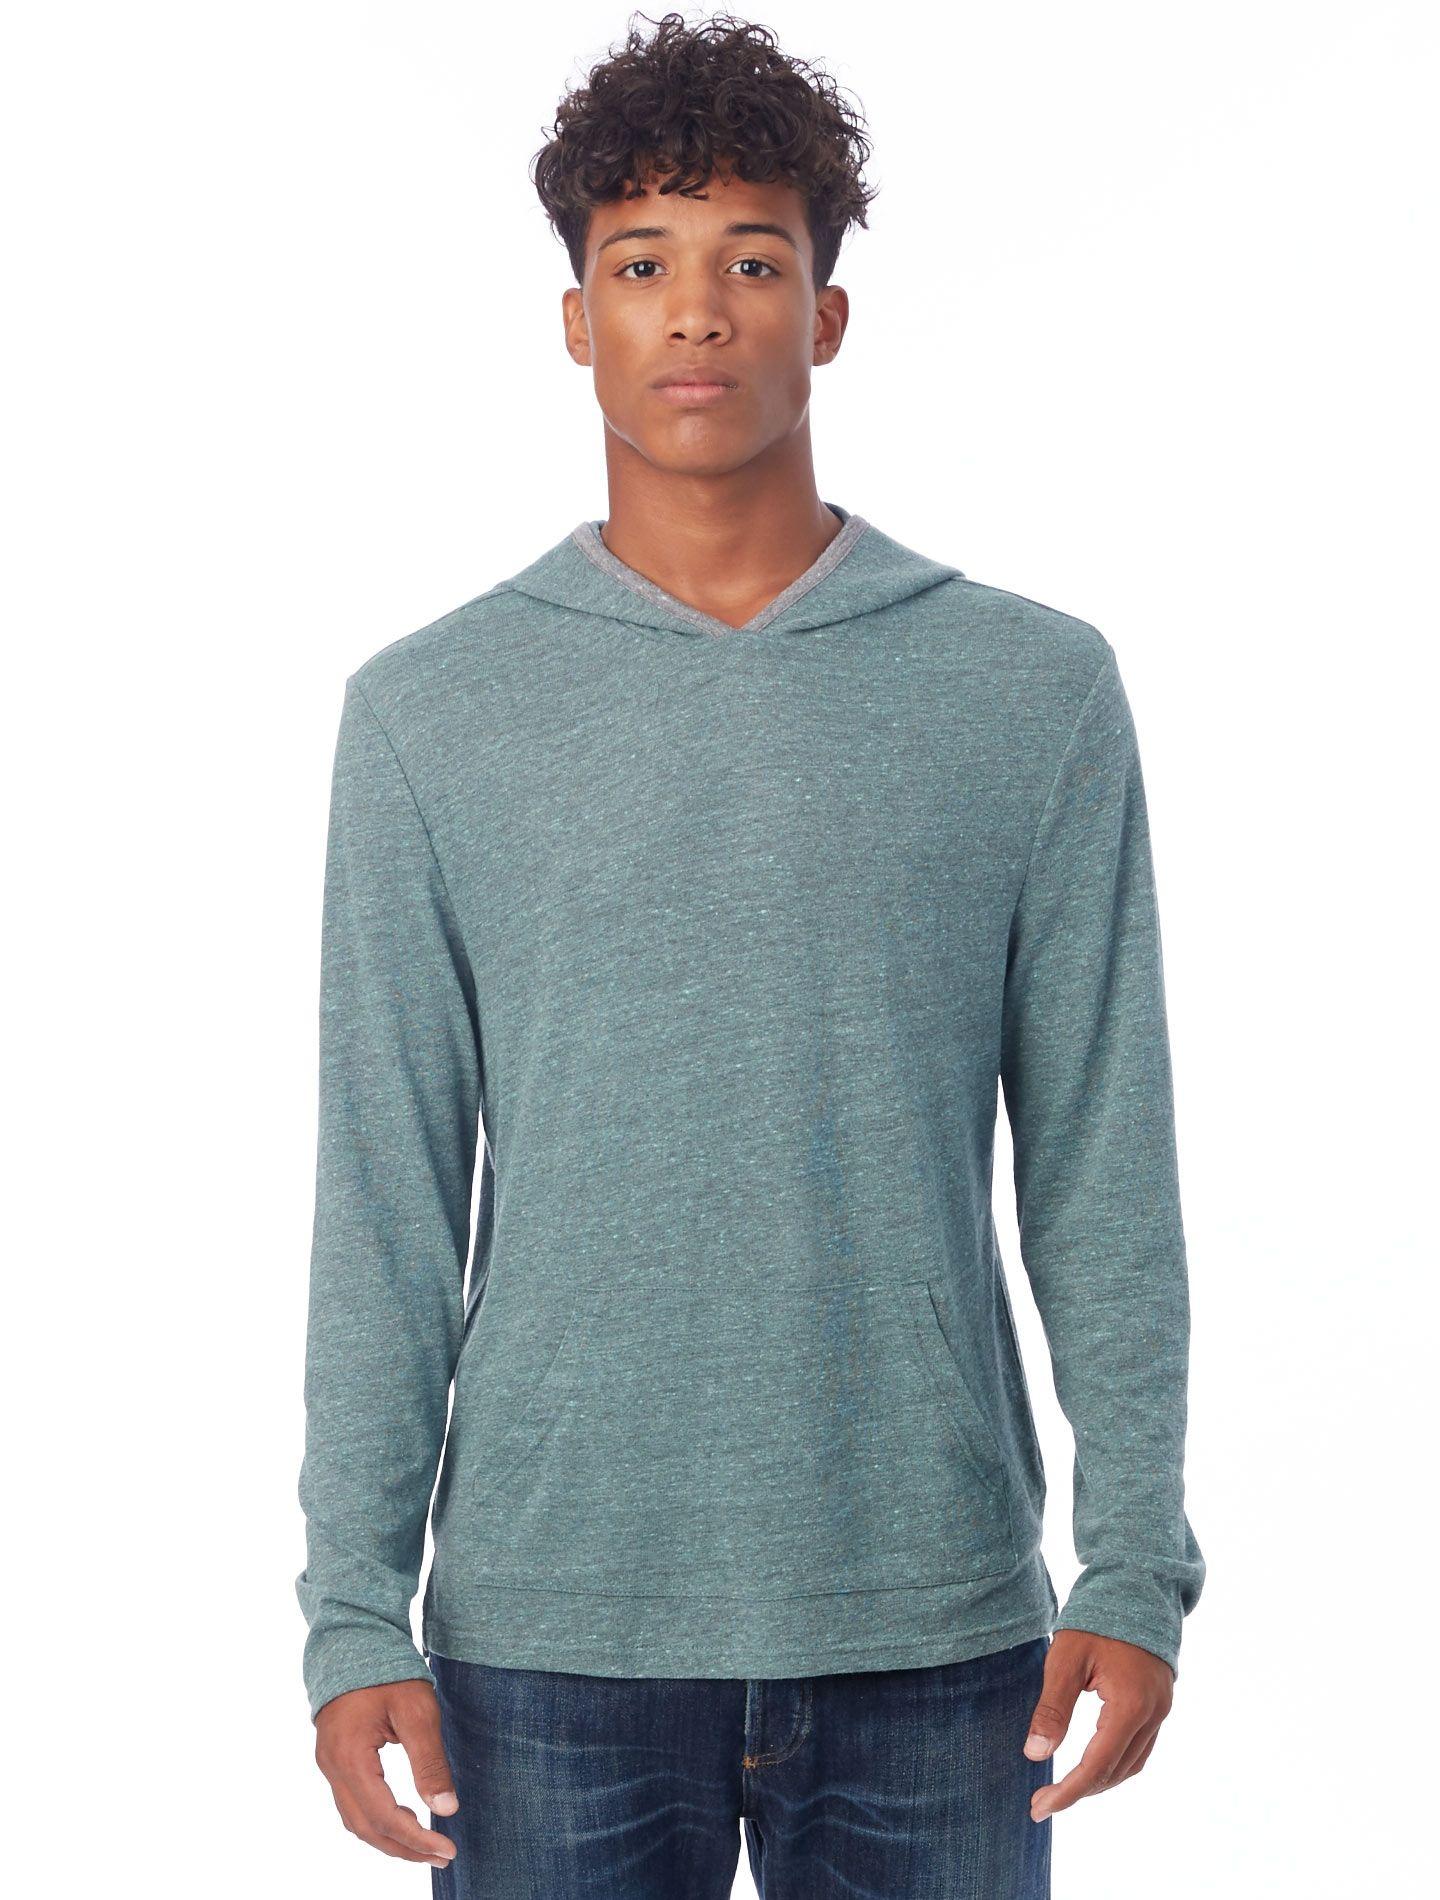 Marathon Eco-Jersey Pullover Hoodie   Clothes   Pinterest b86ff9d504